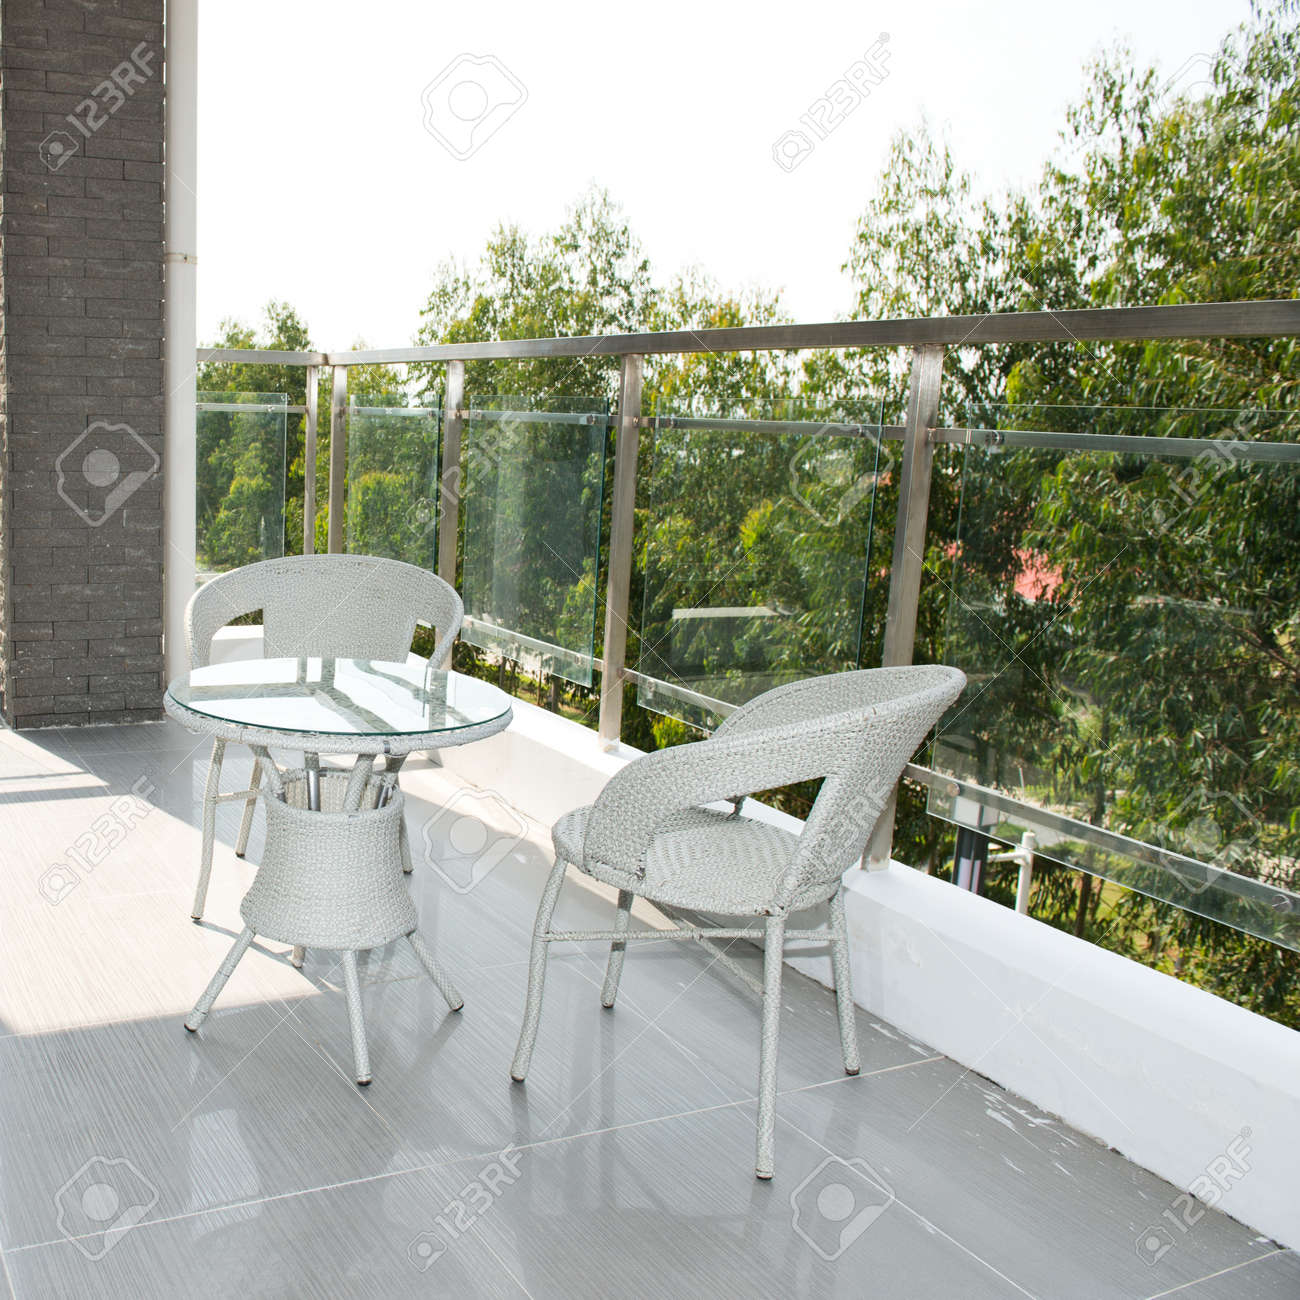 Balcone con tavolo bianco e sedie in una grande casa. foto royalty ...